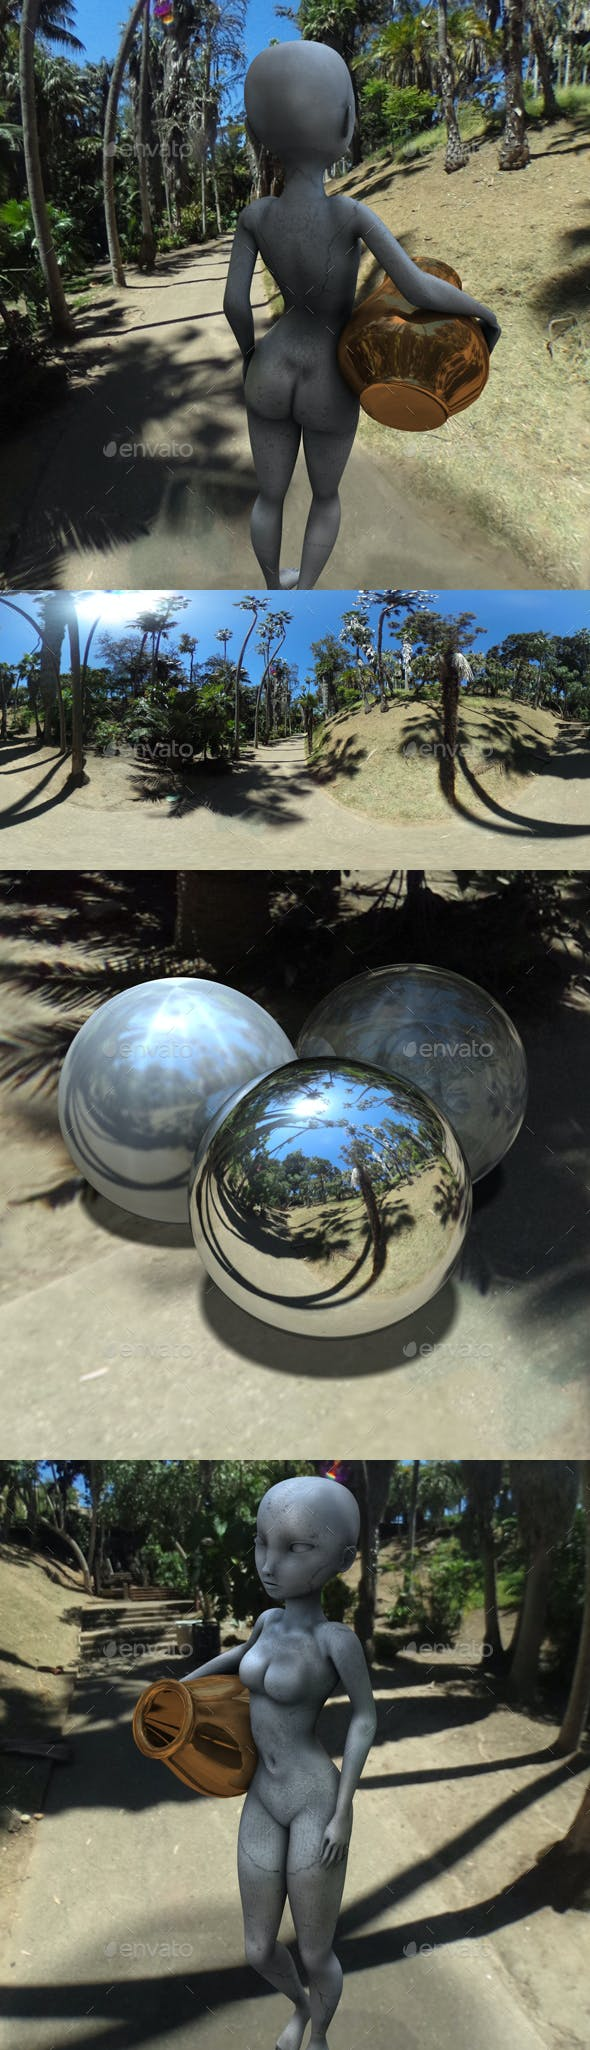 Tropical Trail Blue Sky HDRI - 3DOcean Item for Sale